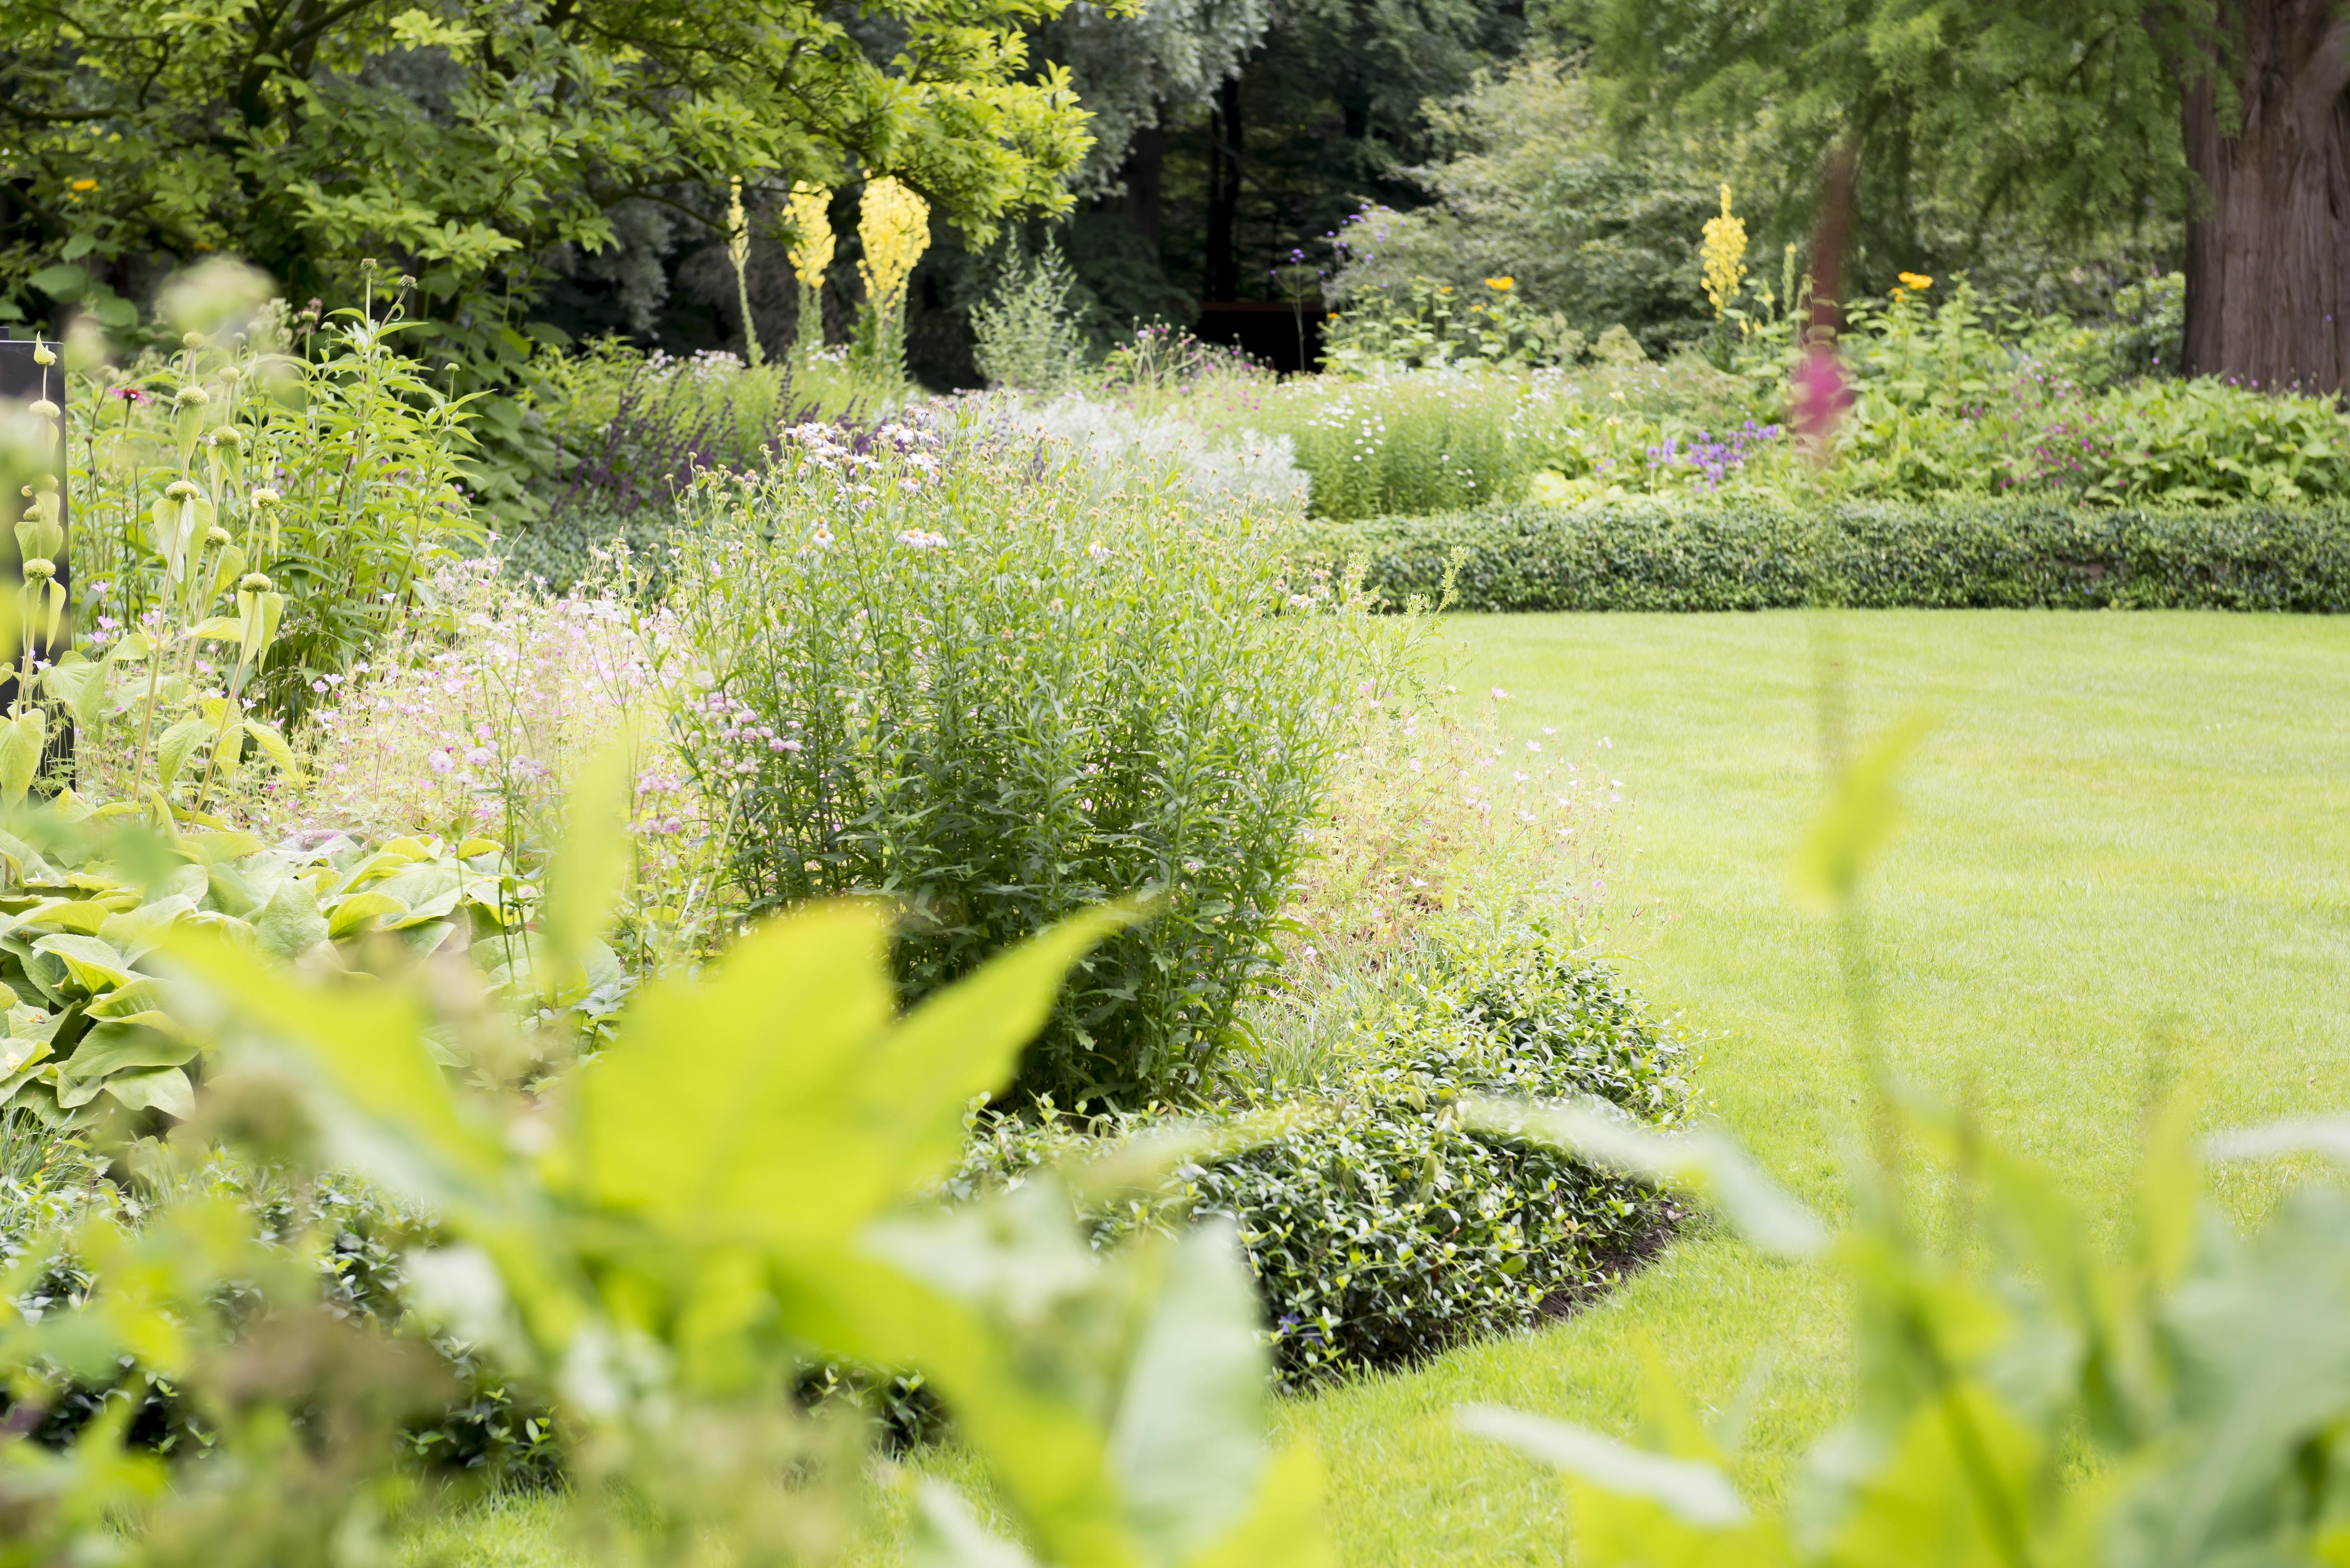 Sproei Installatie Tuin : Tuin water geven hoveniersbedrijf jonnie michelbrink